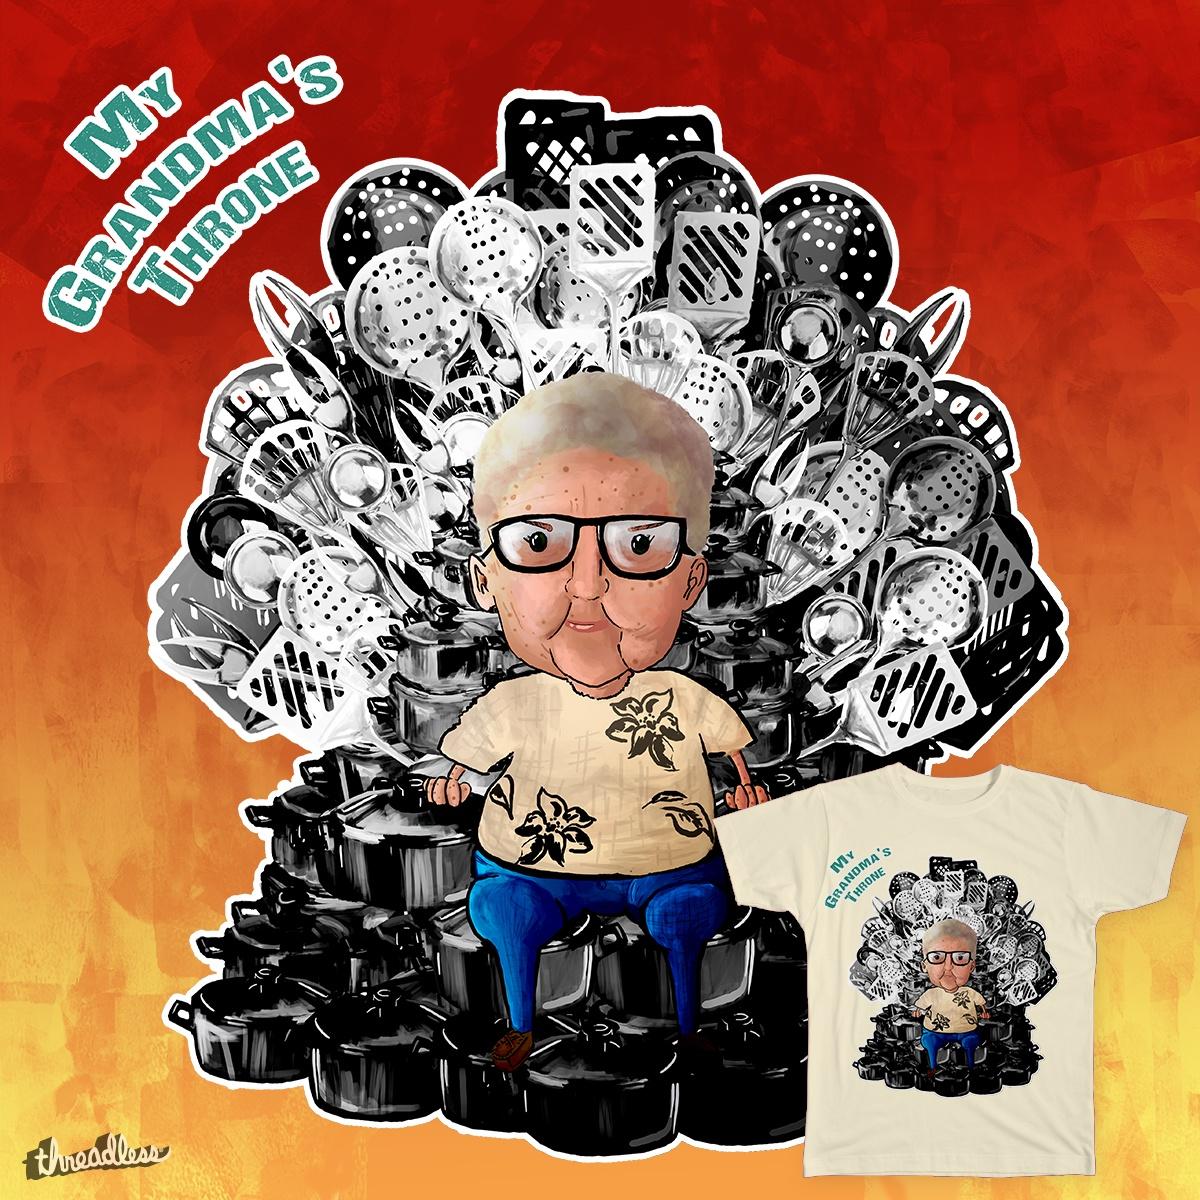 Score Grandma S Throne By Thepalebluedot On Threadless